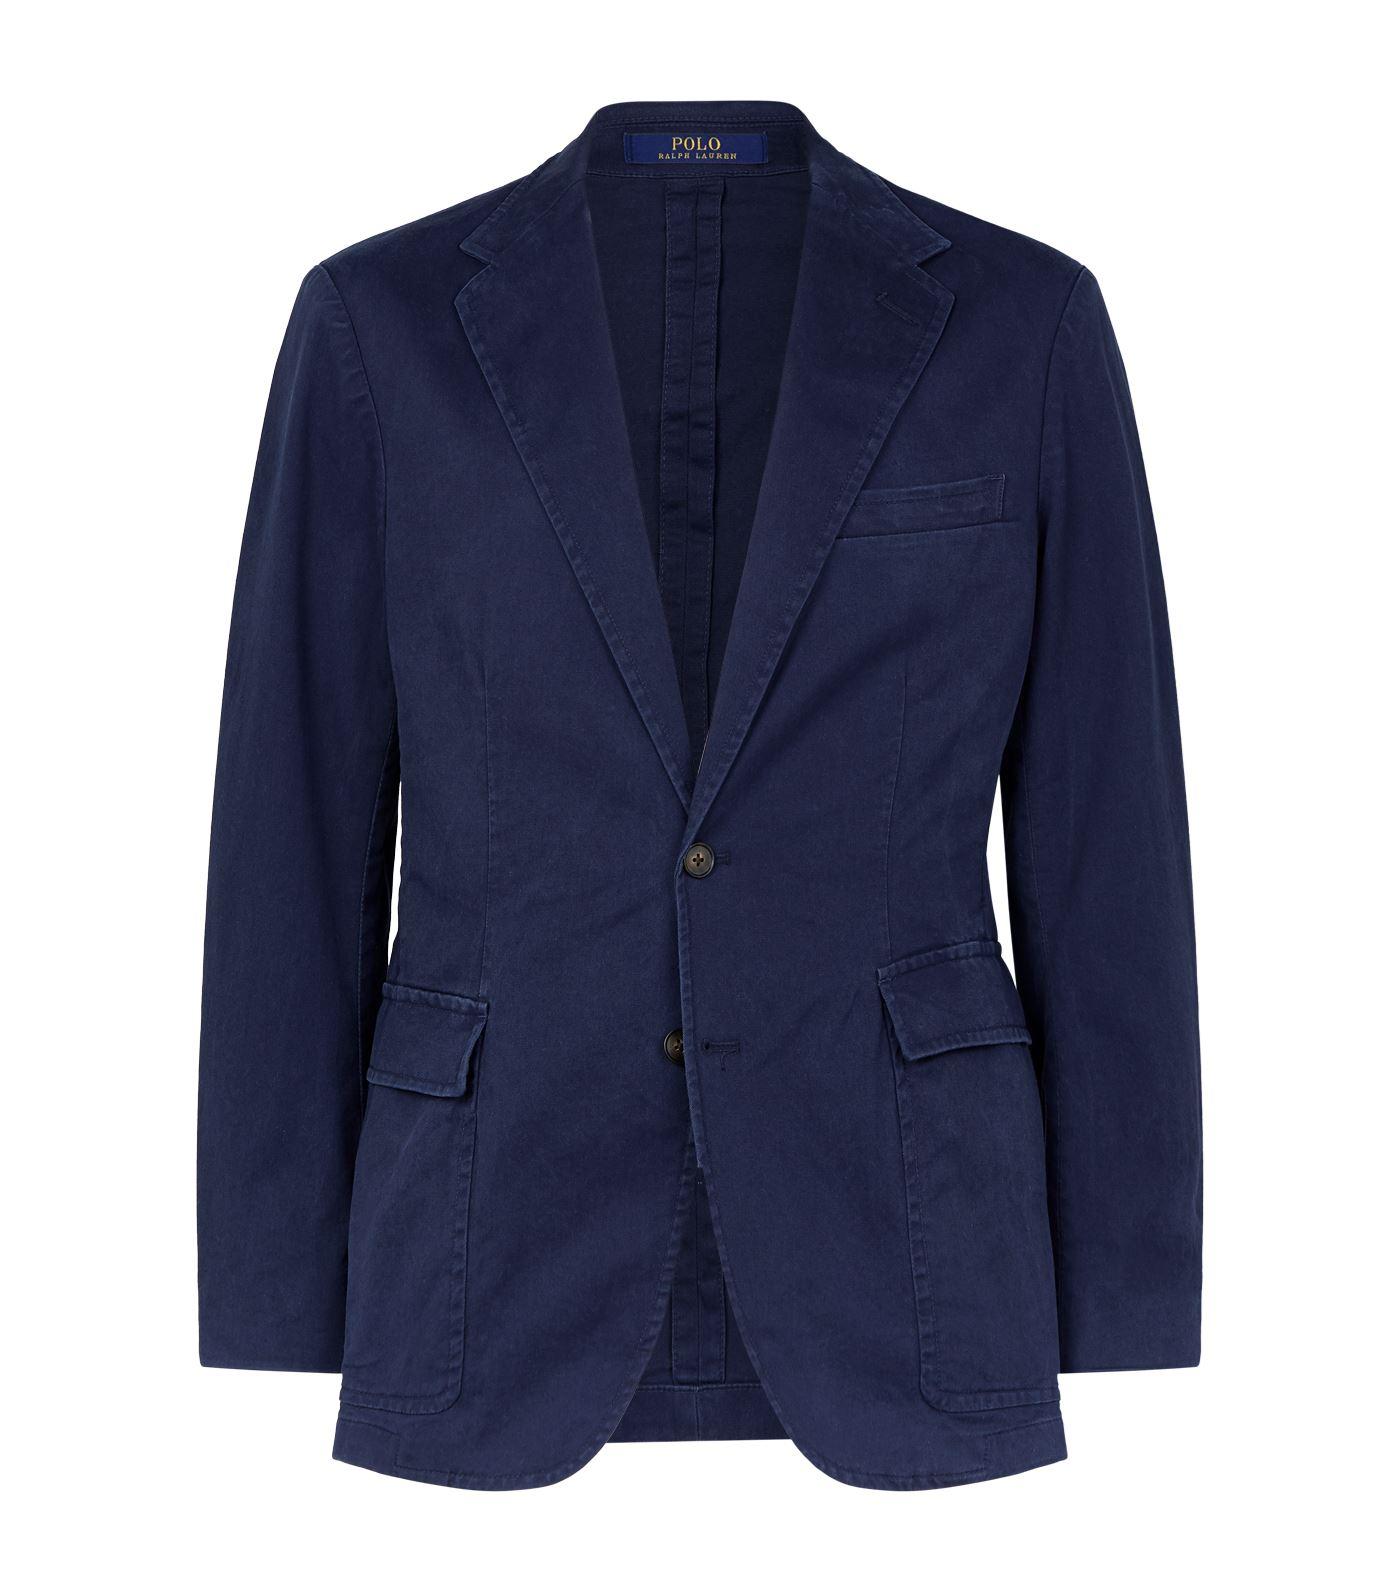 Polo Ralph Lauren - Encompassing the label's preppy aesthetic, this Polo Ralph Lauren blazer is the